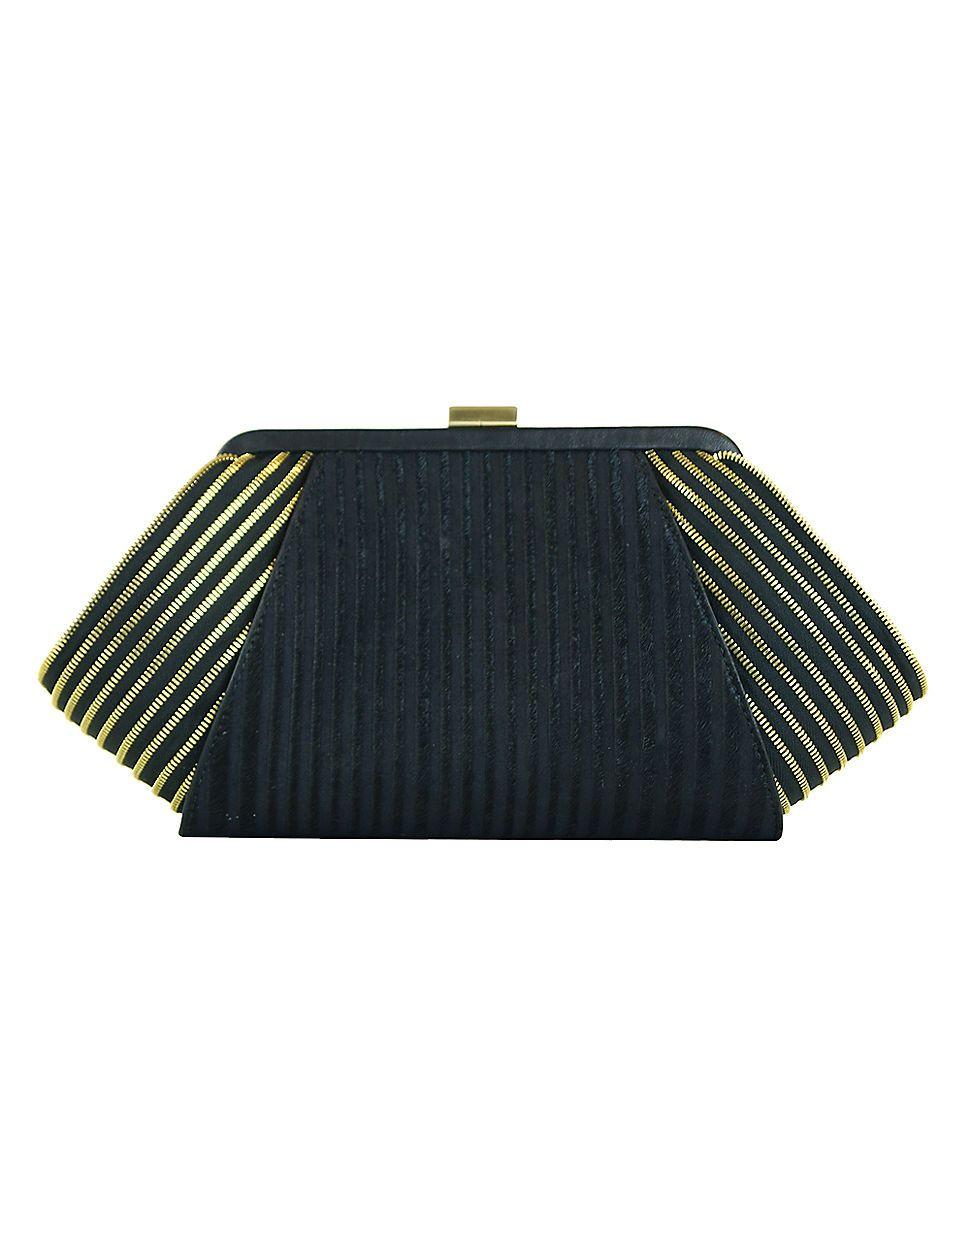 black and gold evening #clutch by Zac Zac Posen, $375   Hudson's Bay